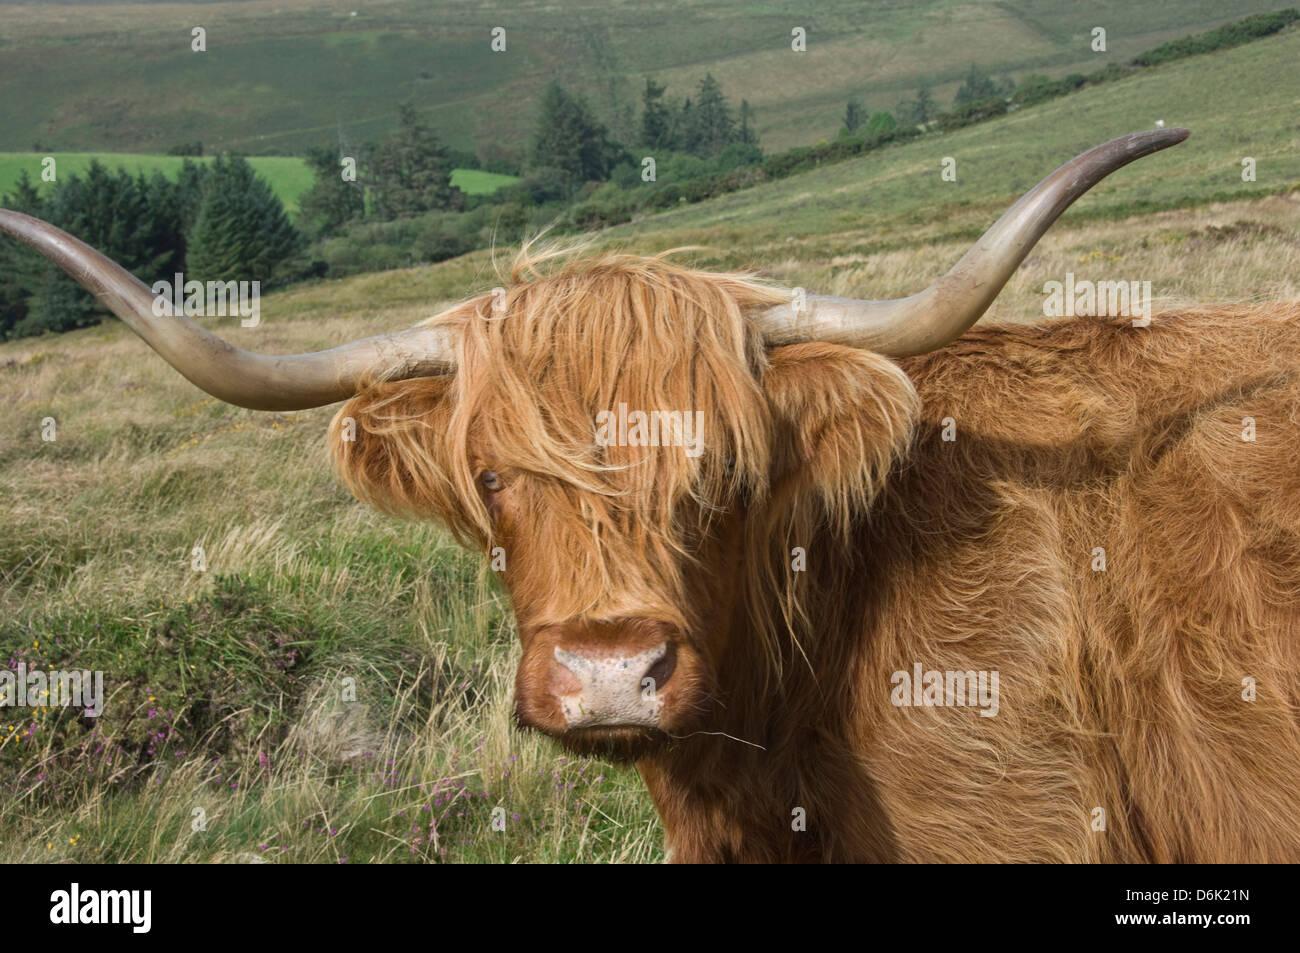 Highland cattle grazing on Dartmoor, Dartmoor National Park, Devon, England, United Kingdom, Europe - Stock Image